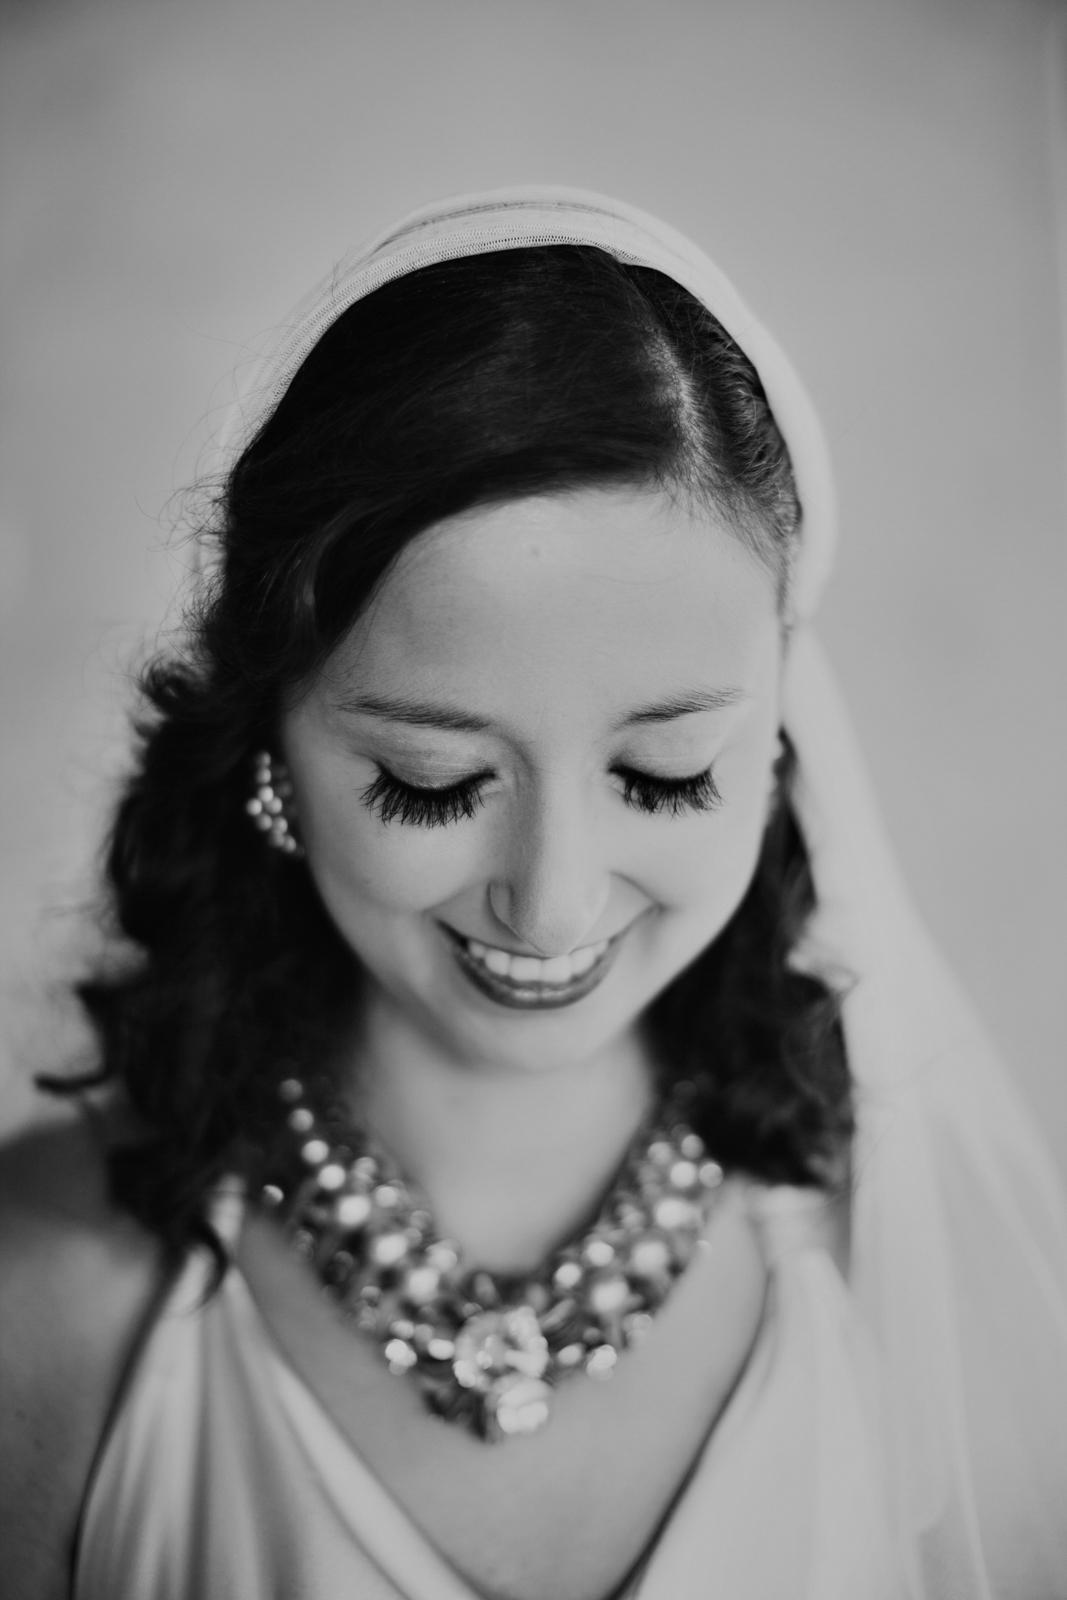 miraflores_winery_wedding_photography_ian_melissa_ebony_siovhan_bokeh_photography_05.jpg